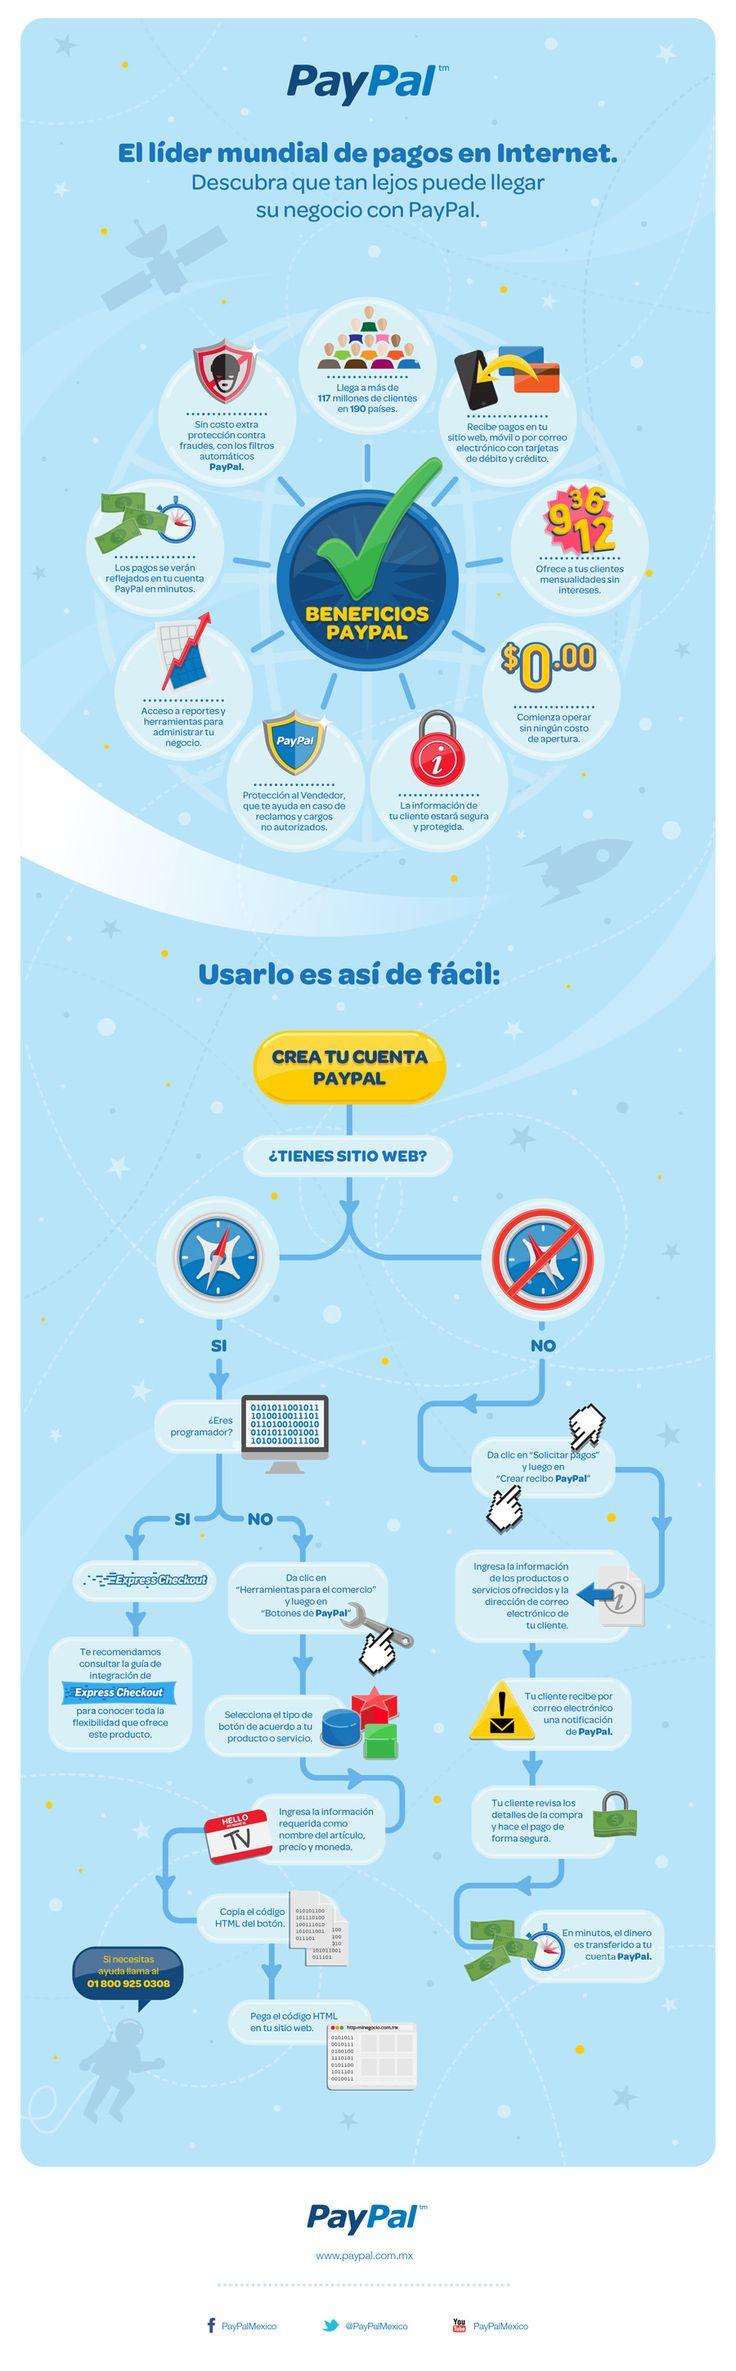 #PayPal: líder mundial de pagos en Internet #infografia